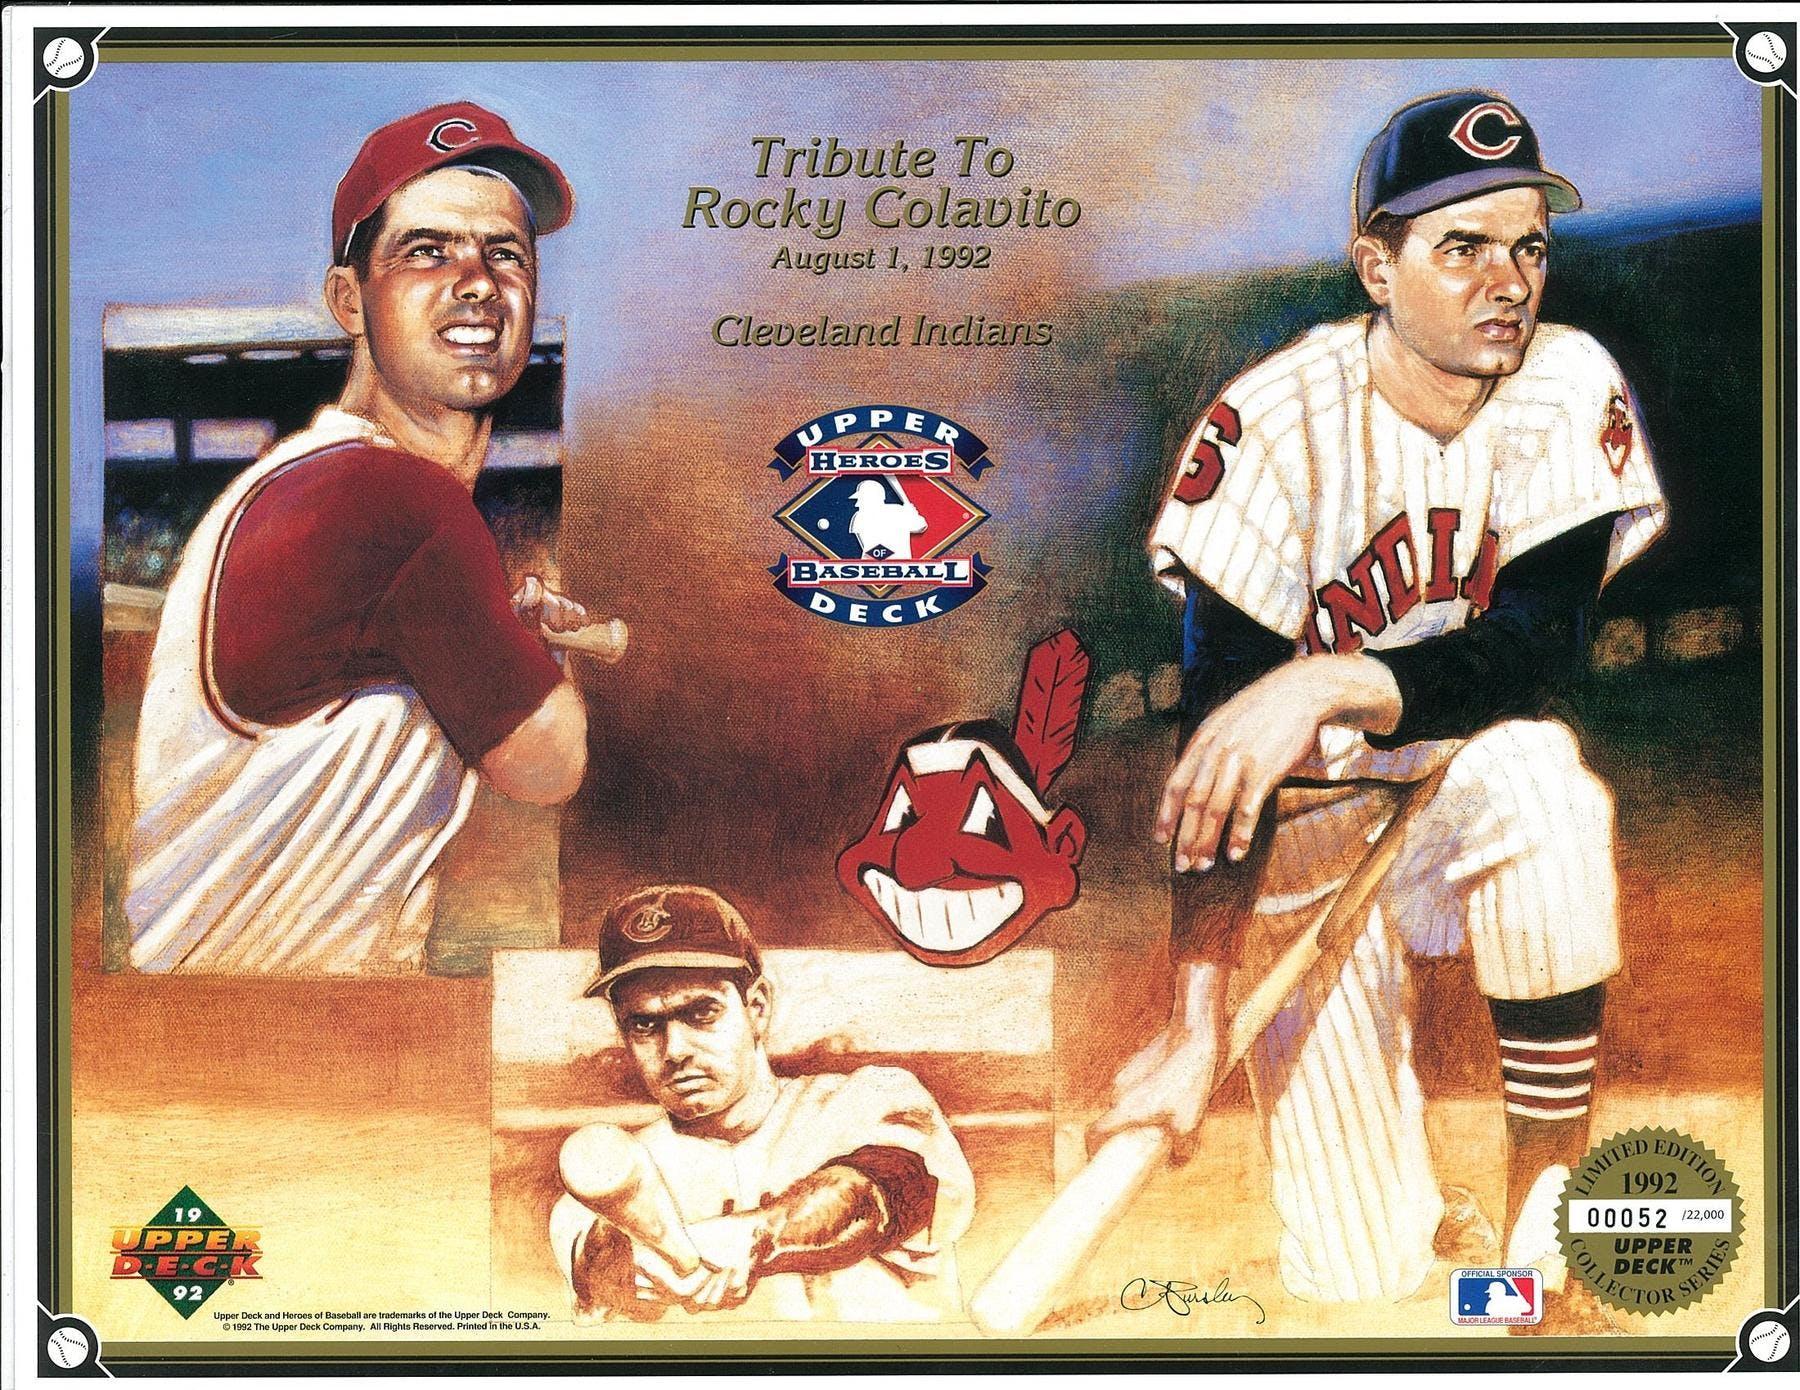 1992 Upper Deck Heroes Of Baseball Rocky Colavito Tribute Commemorative Sheet